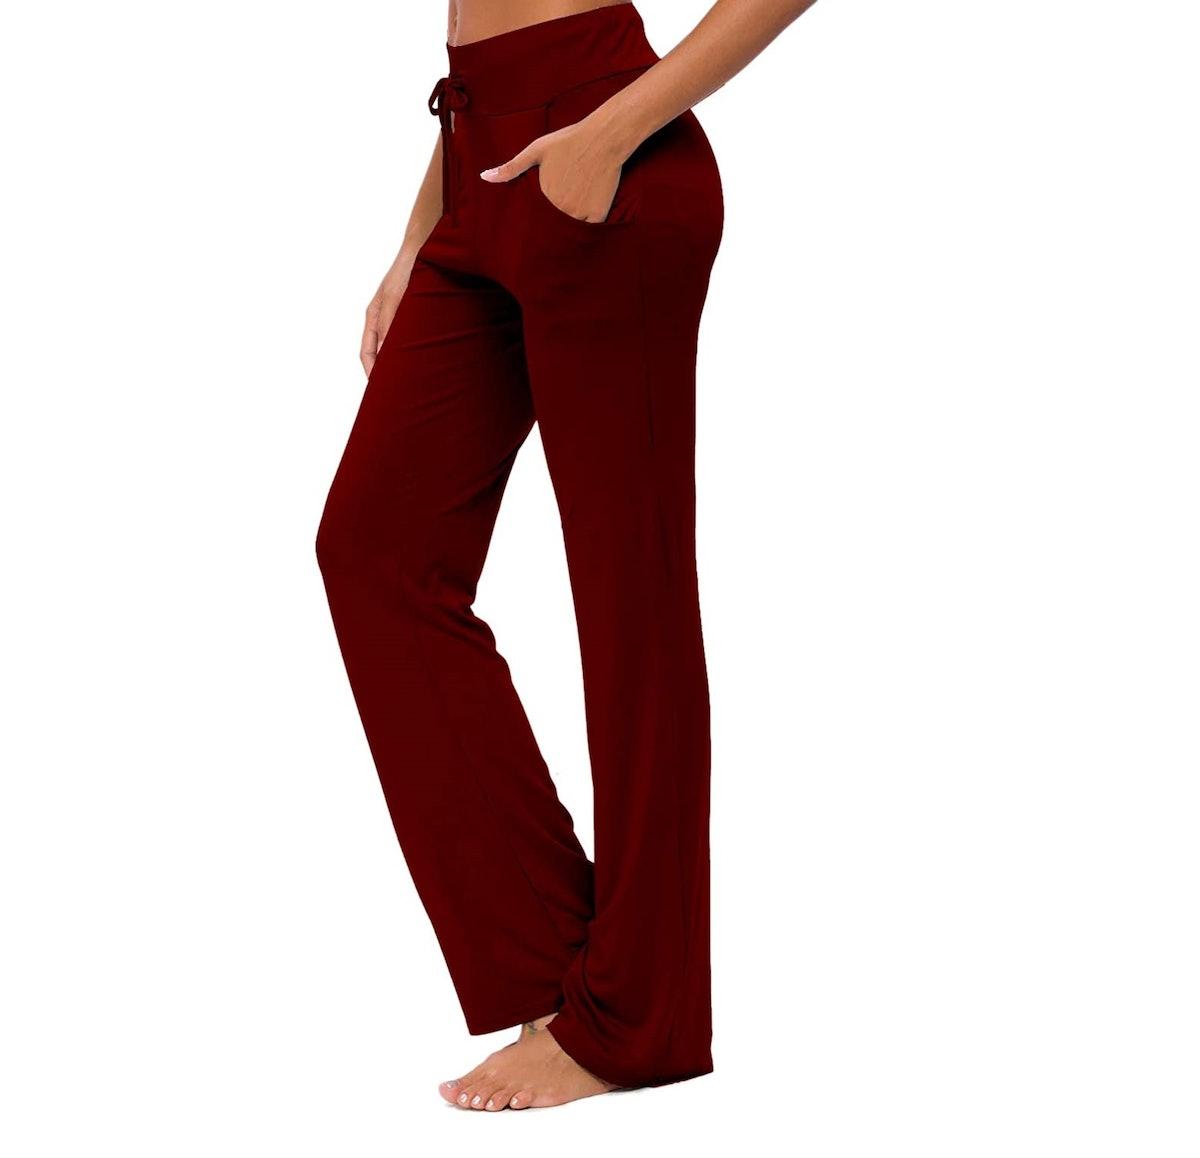 ADANIKI Drawstring Flare Yoga Pants